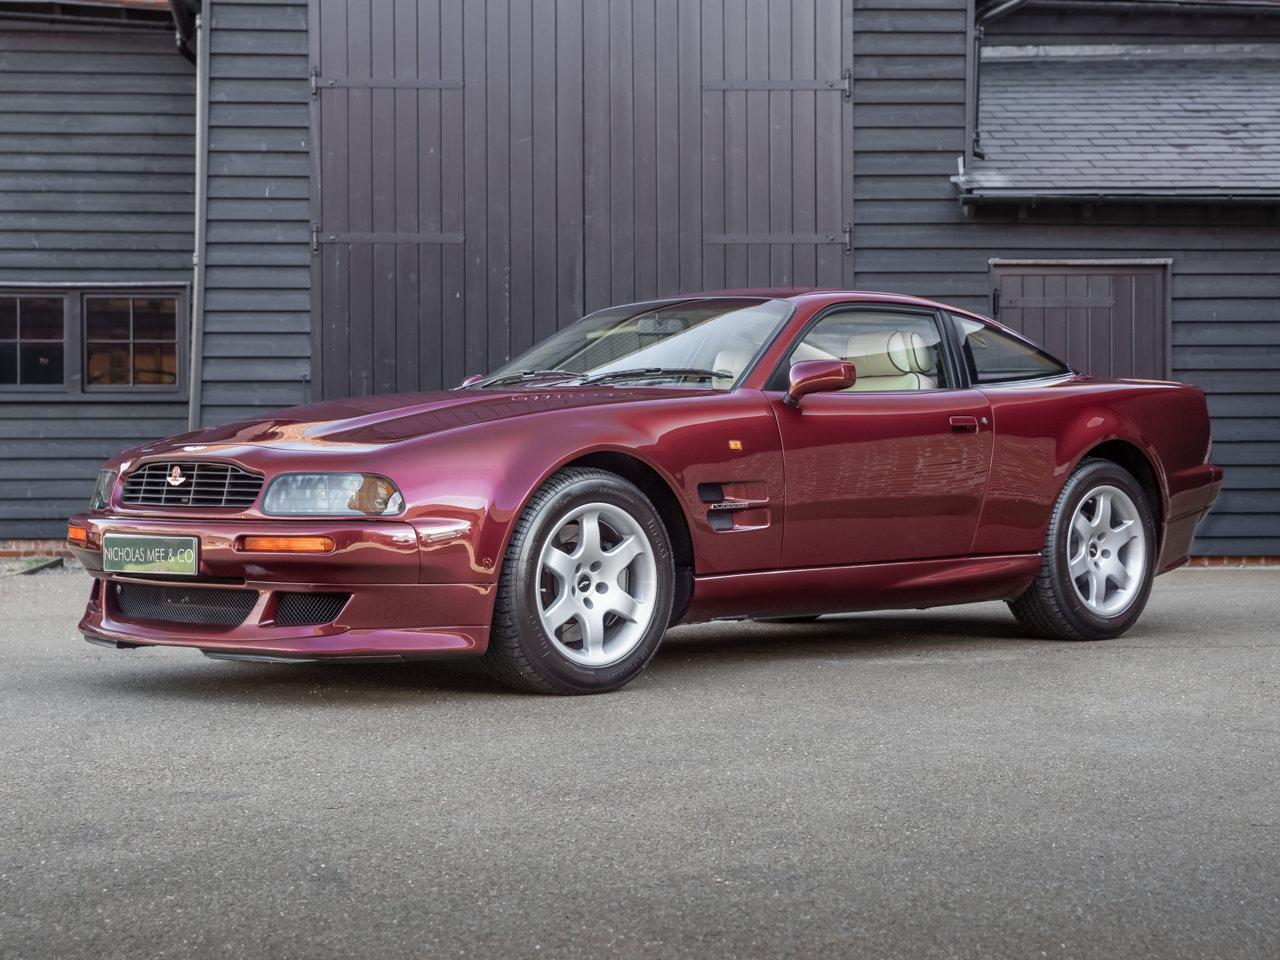 1996 Aston Martin Vantage V550 For Sale (picture 1 of 6)